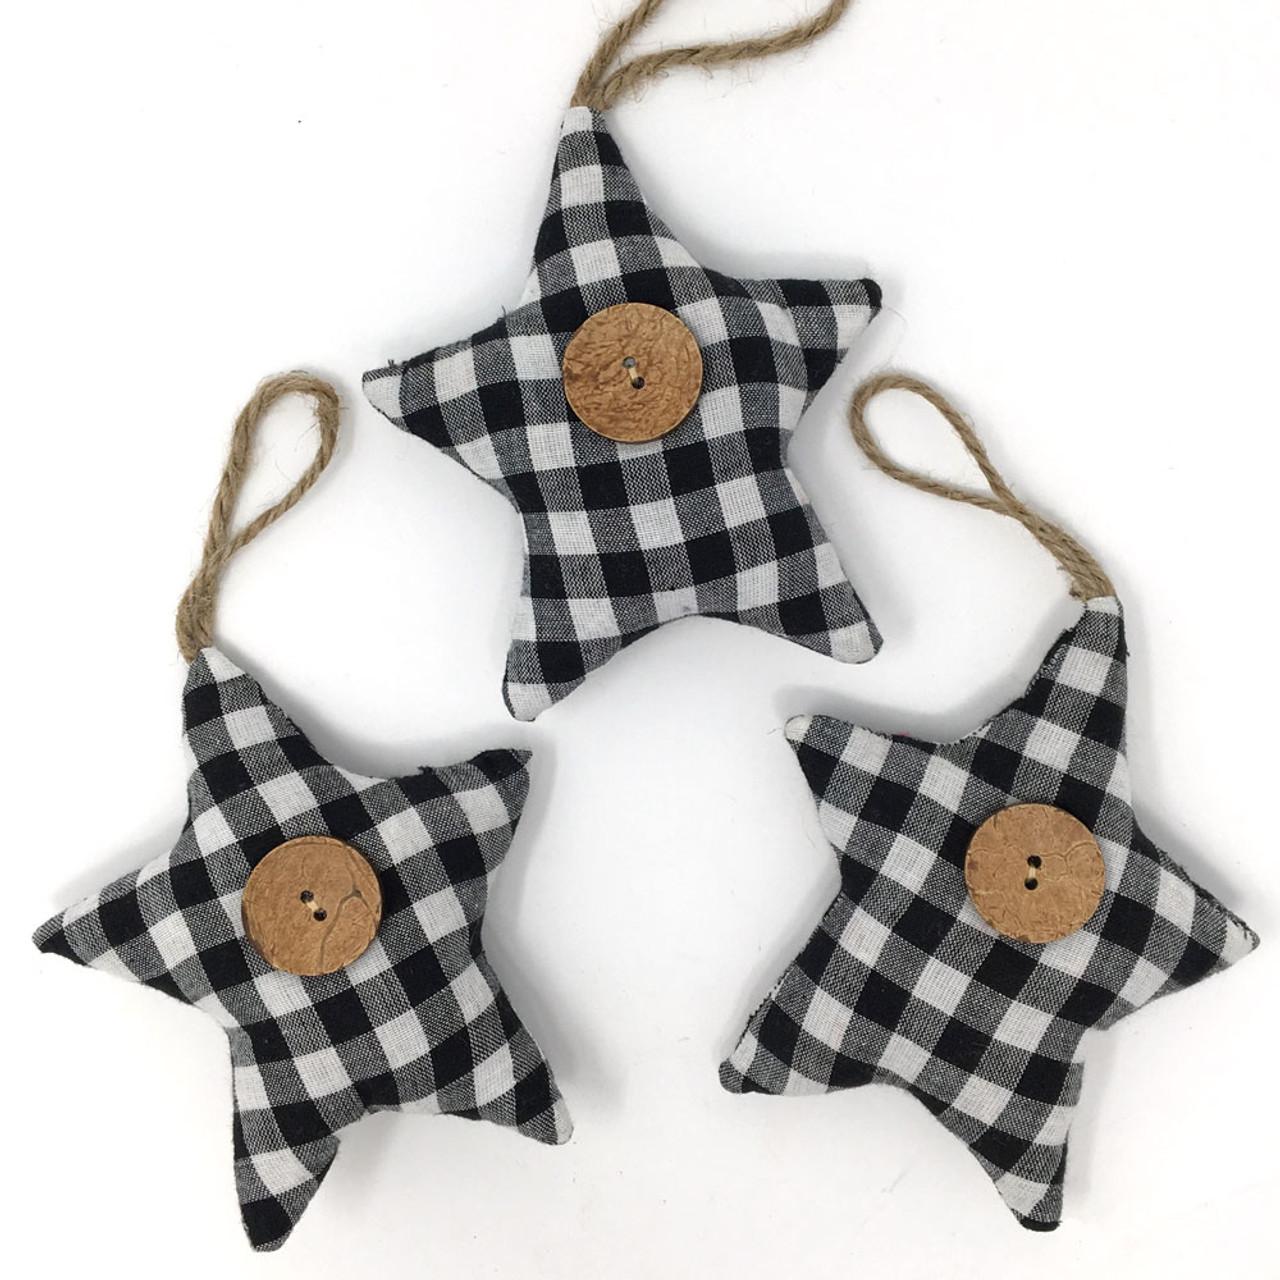 Black & White Mini Buffalo Plaid Homespun Fabric Star Christmas Ornaments - Set of 3